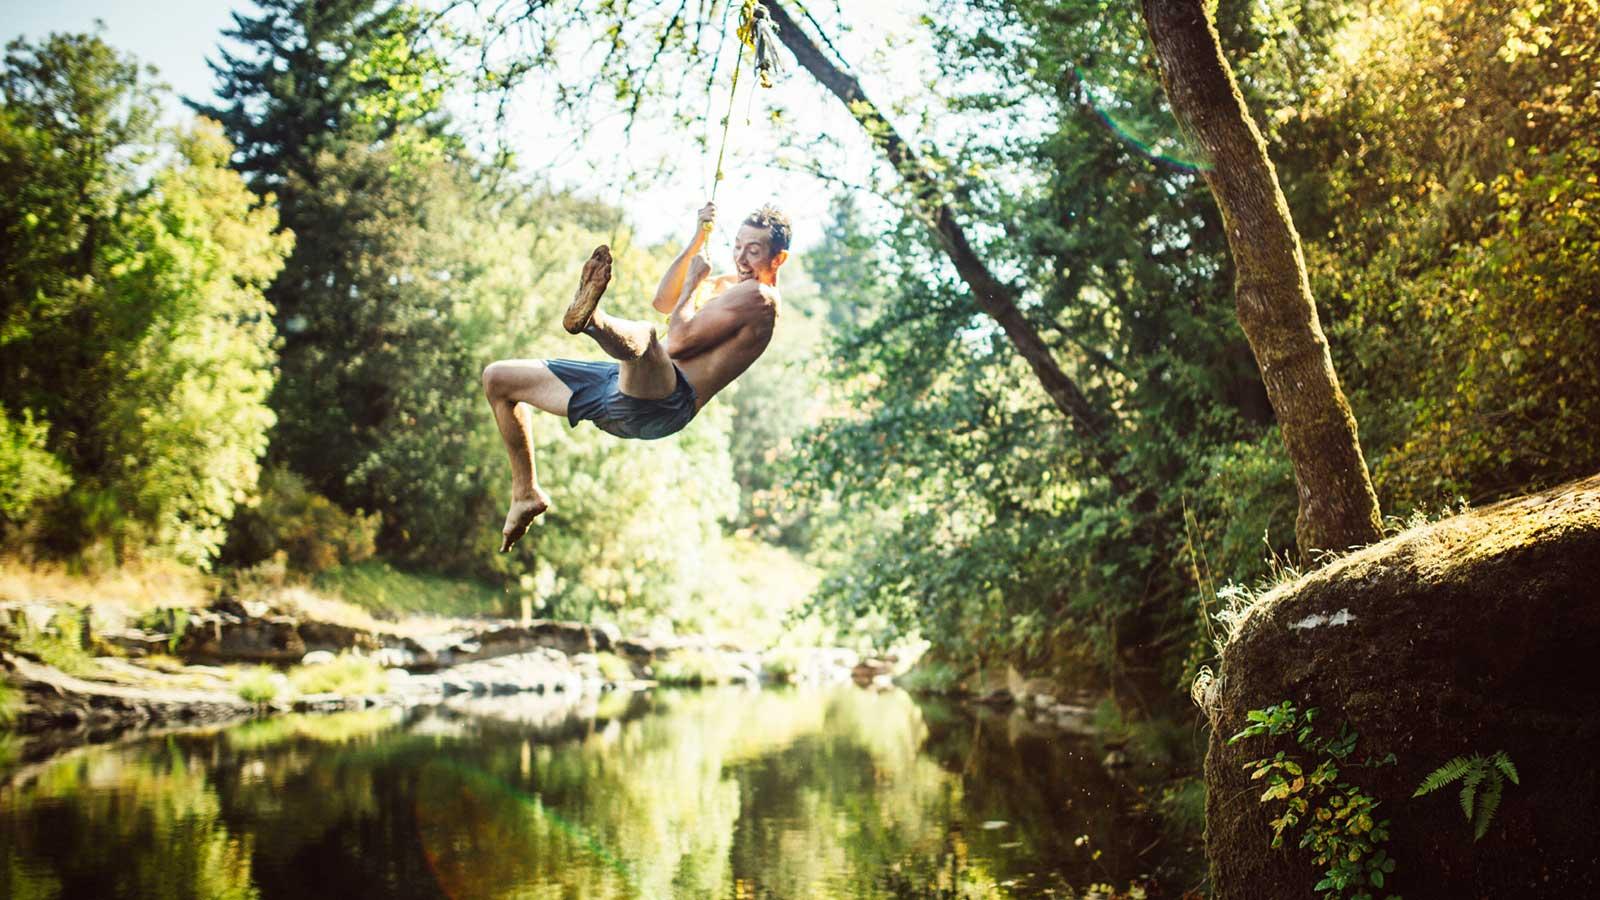 Man jumping into river